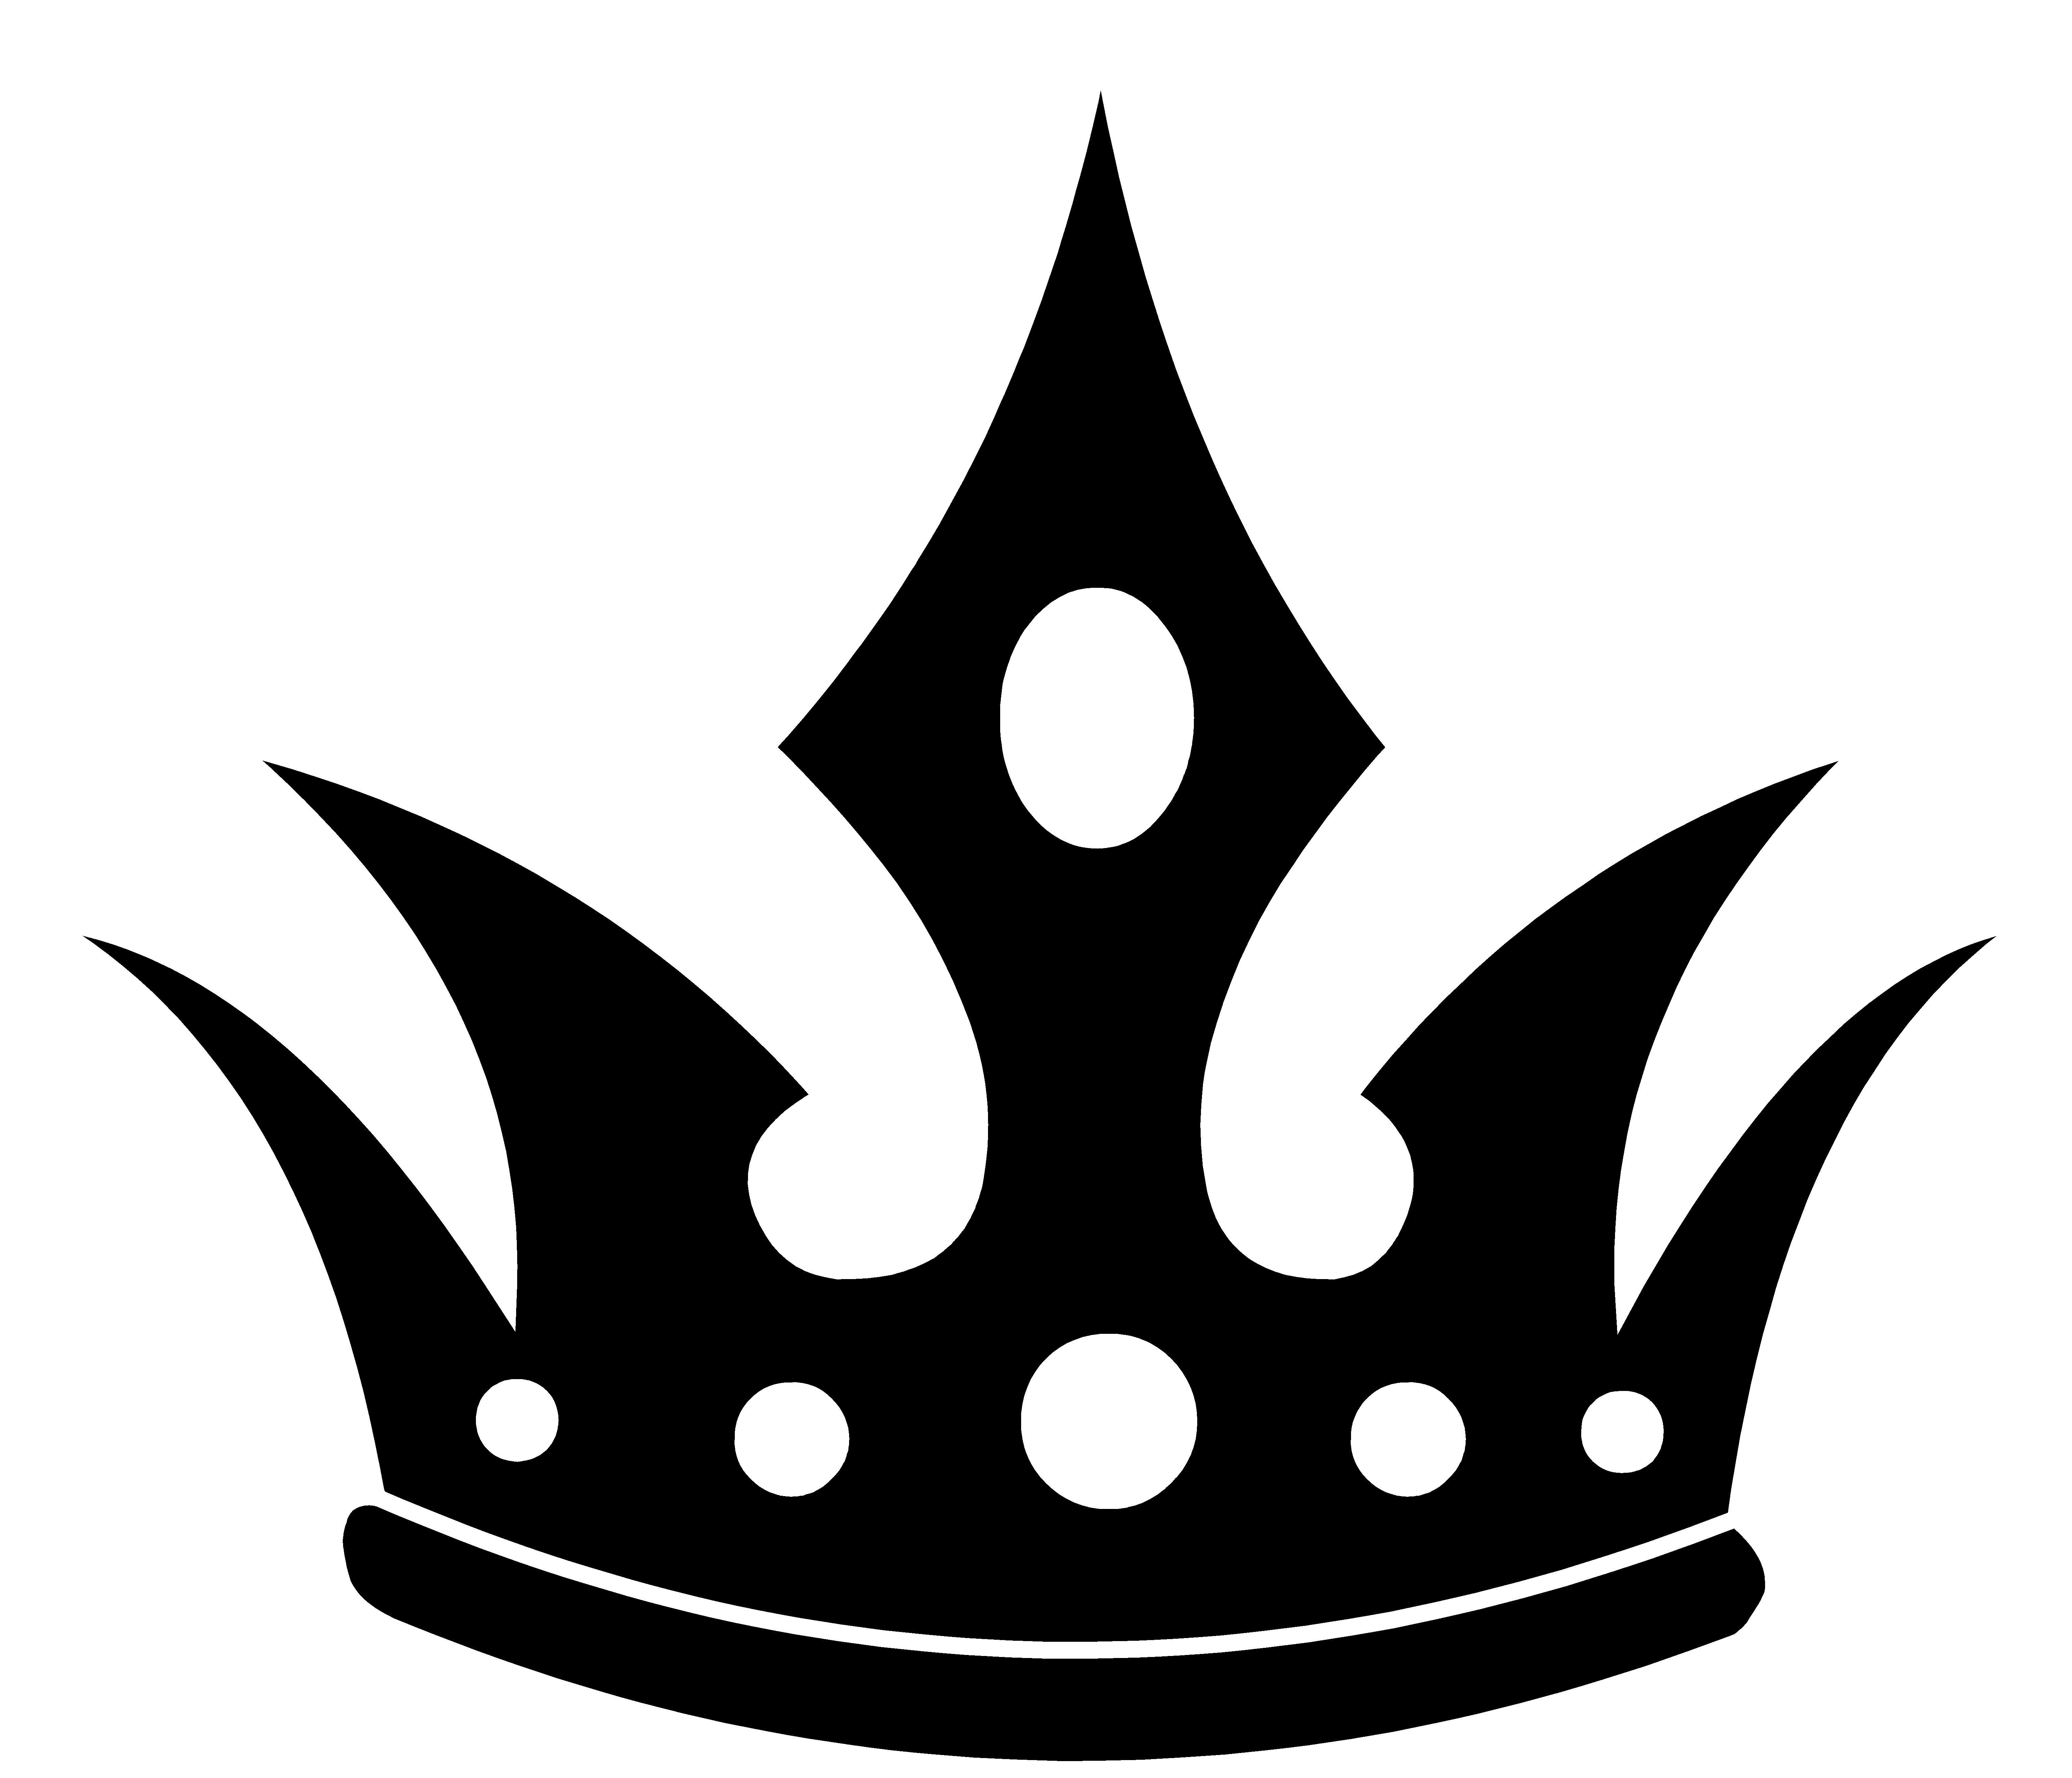 Monarchy Clipart-monarchy clipart-8